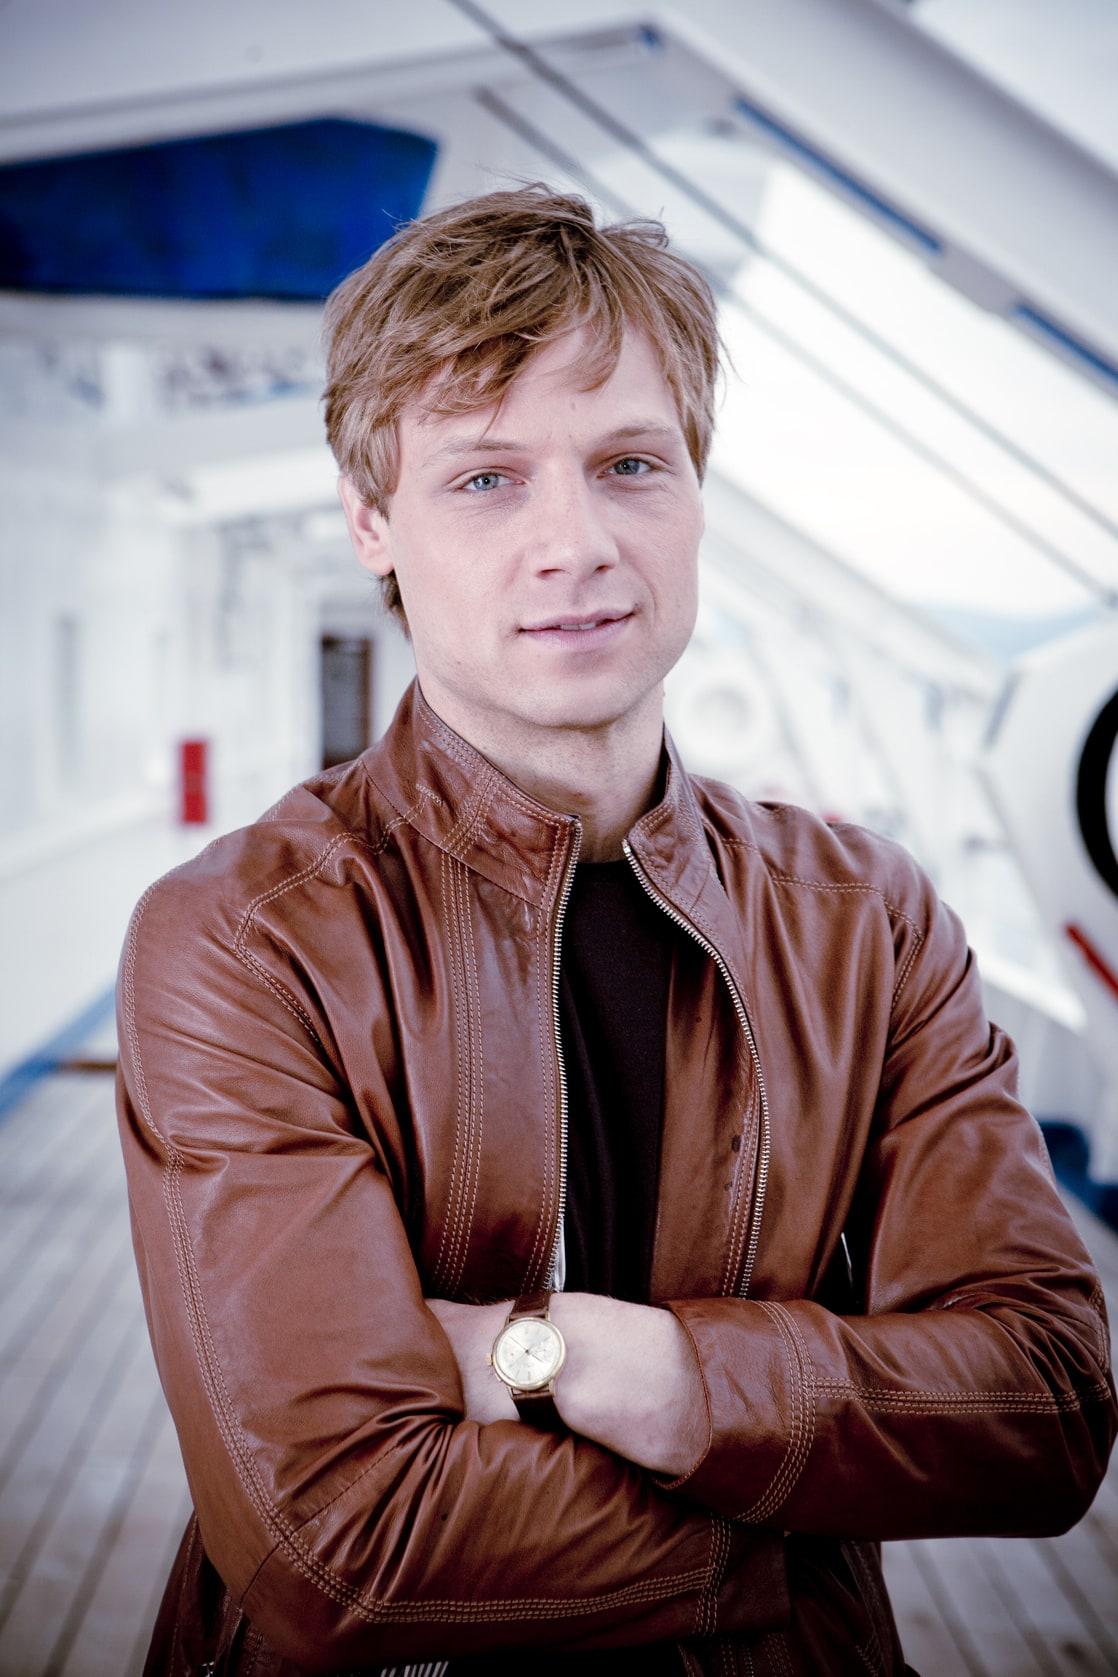 Christoph Letkowski